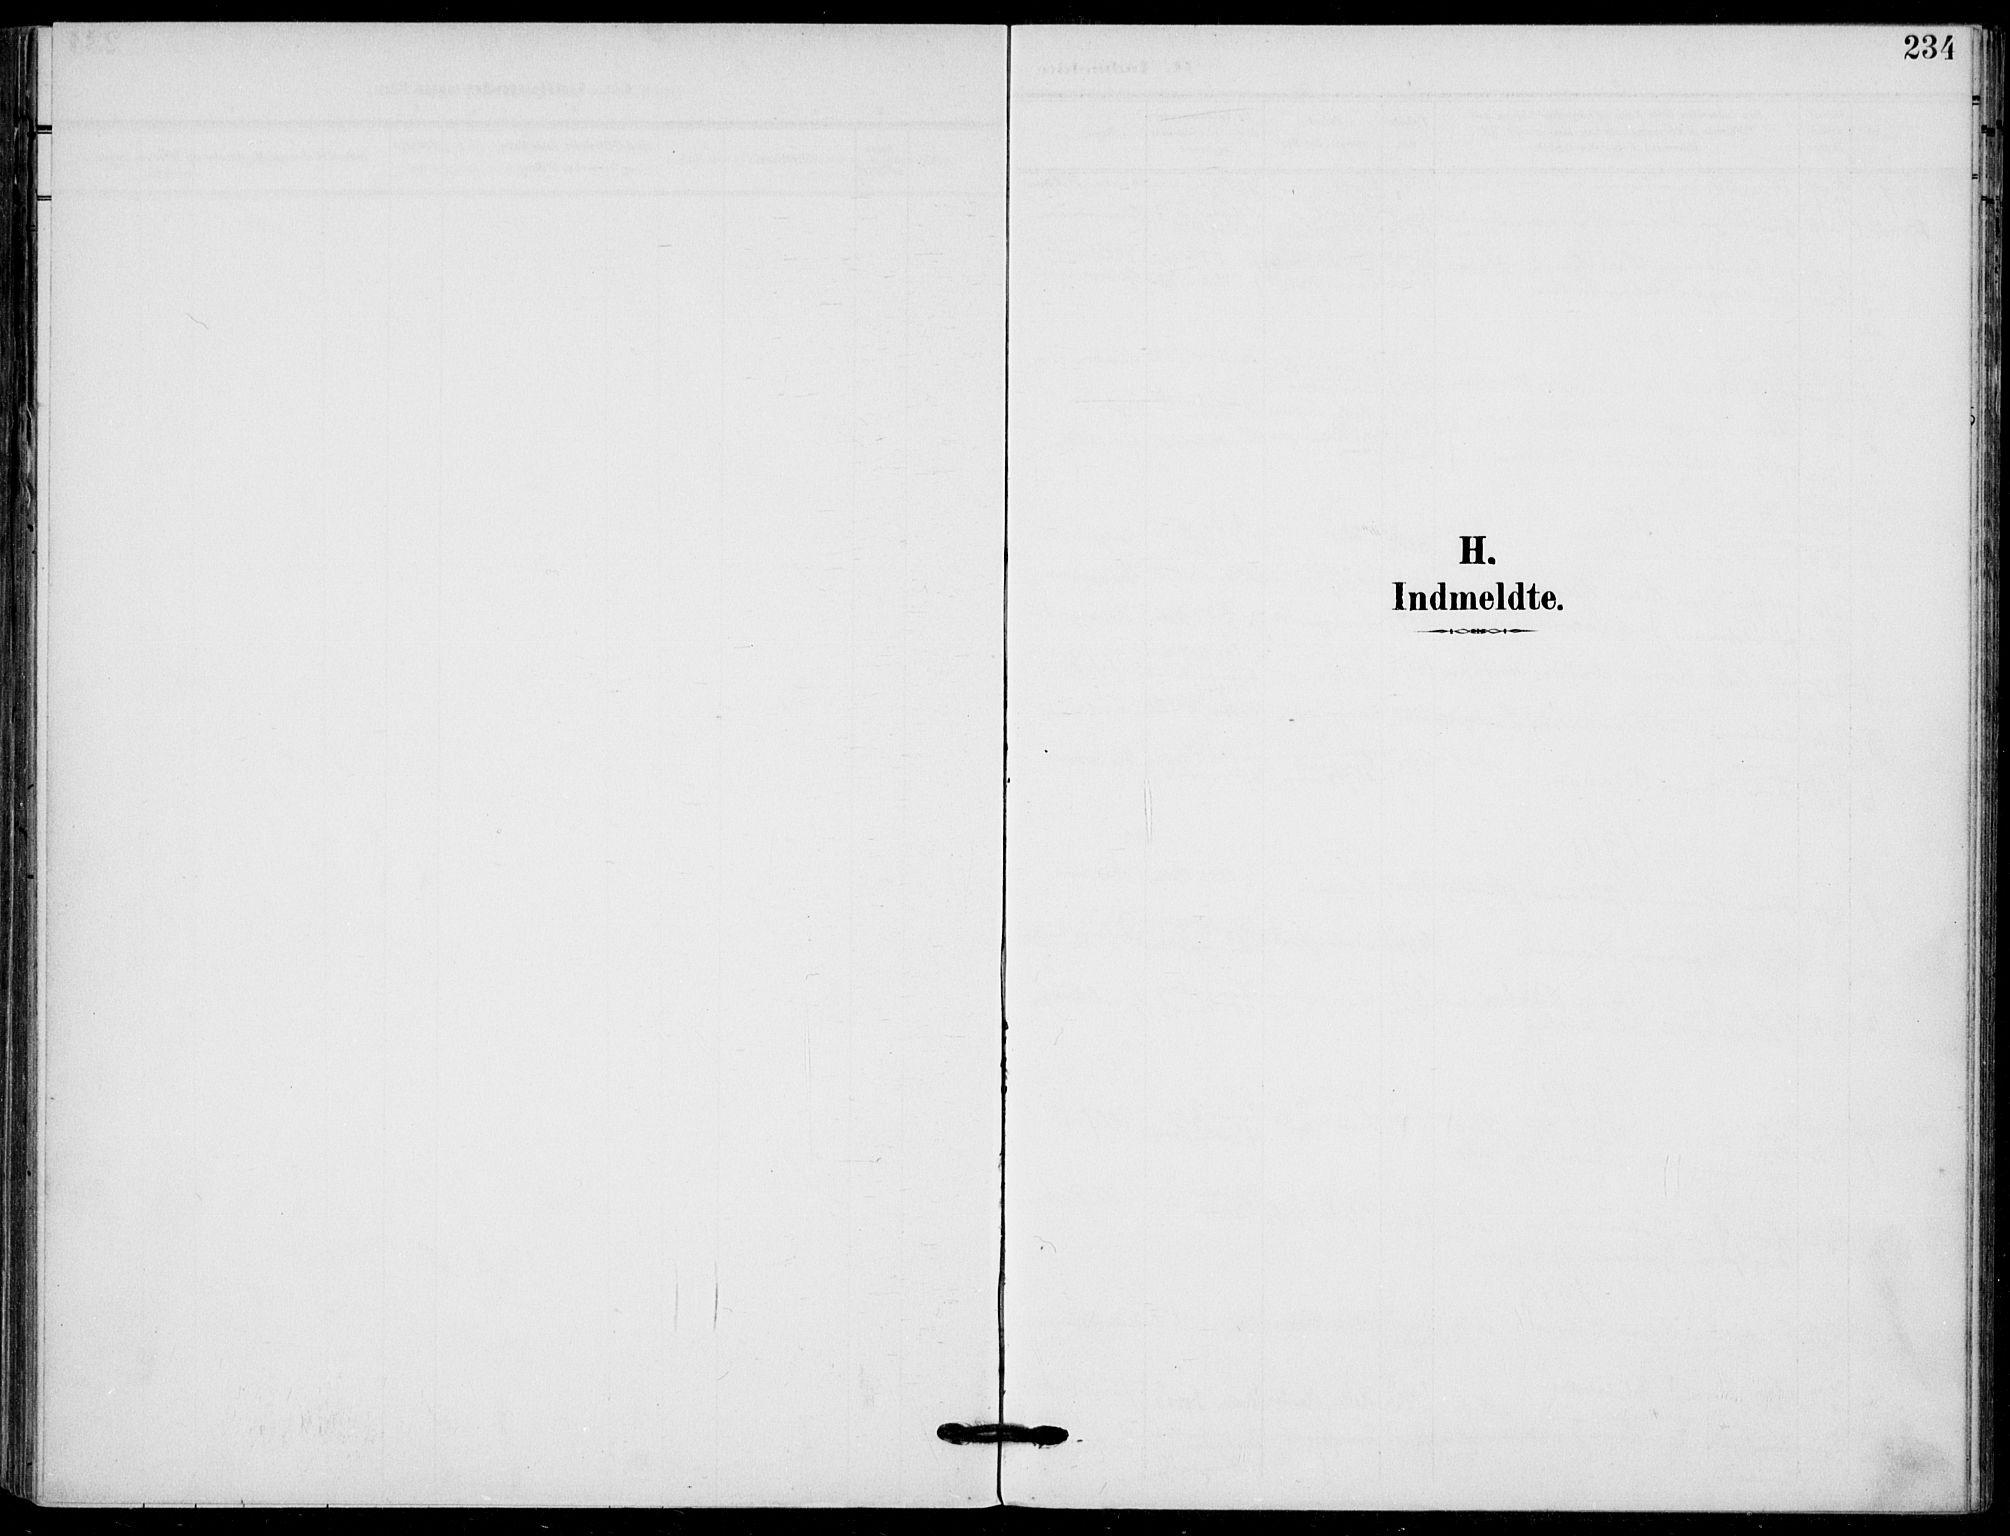 SAKO, Holla kirkebøker, F/Fa/L0012: Ministerialbok nr. 12, 1907-1923, s. 234